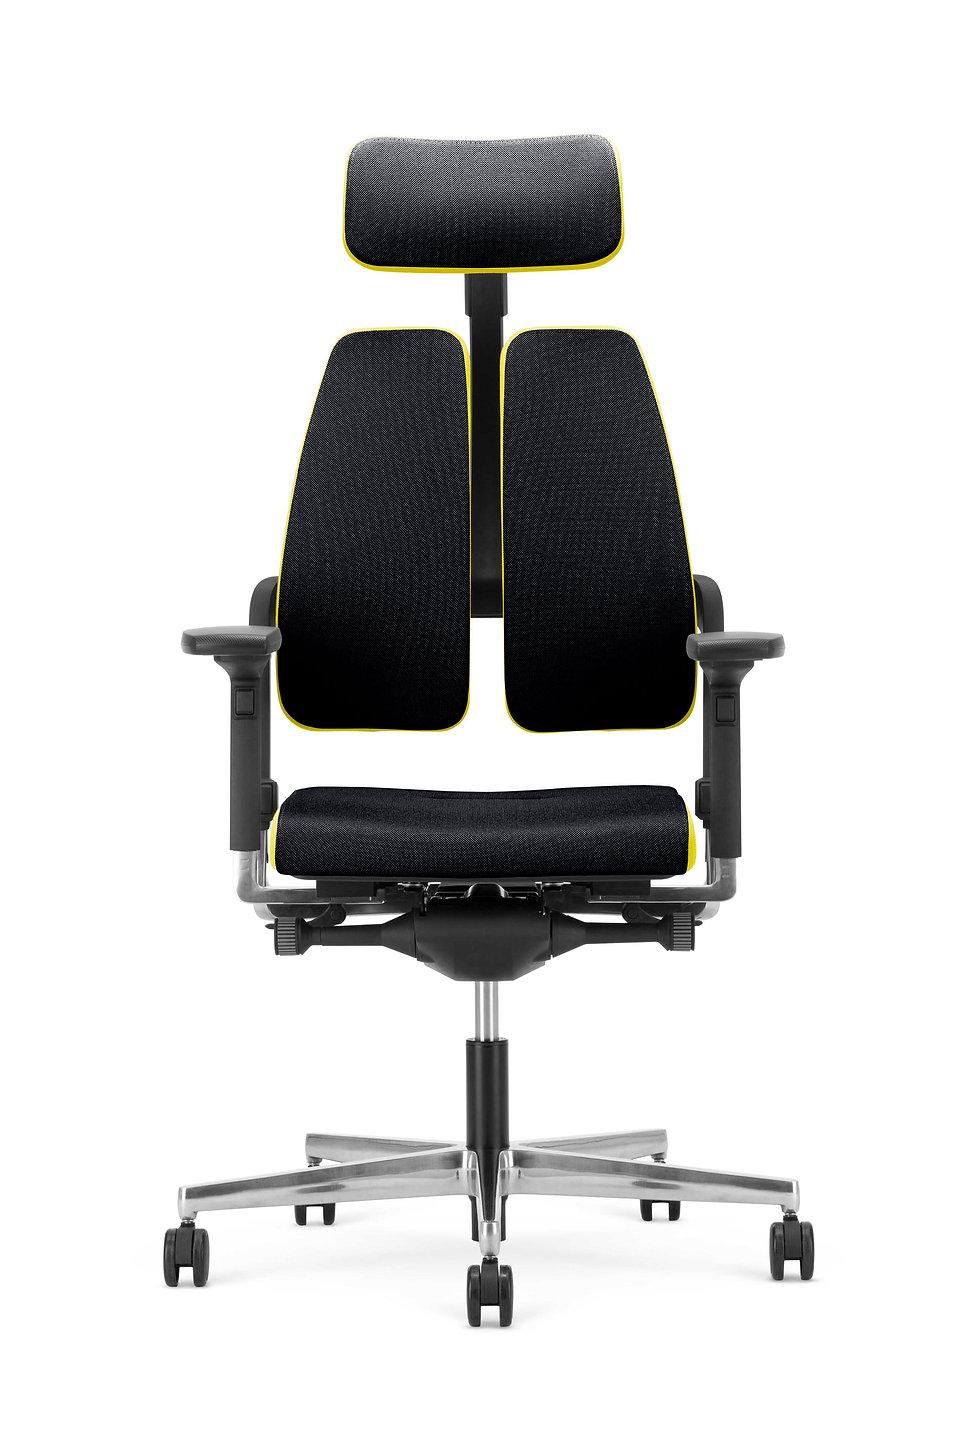 Xilium_DuoBack_office_chair_50%.jpg